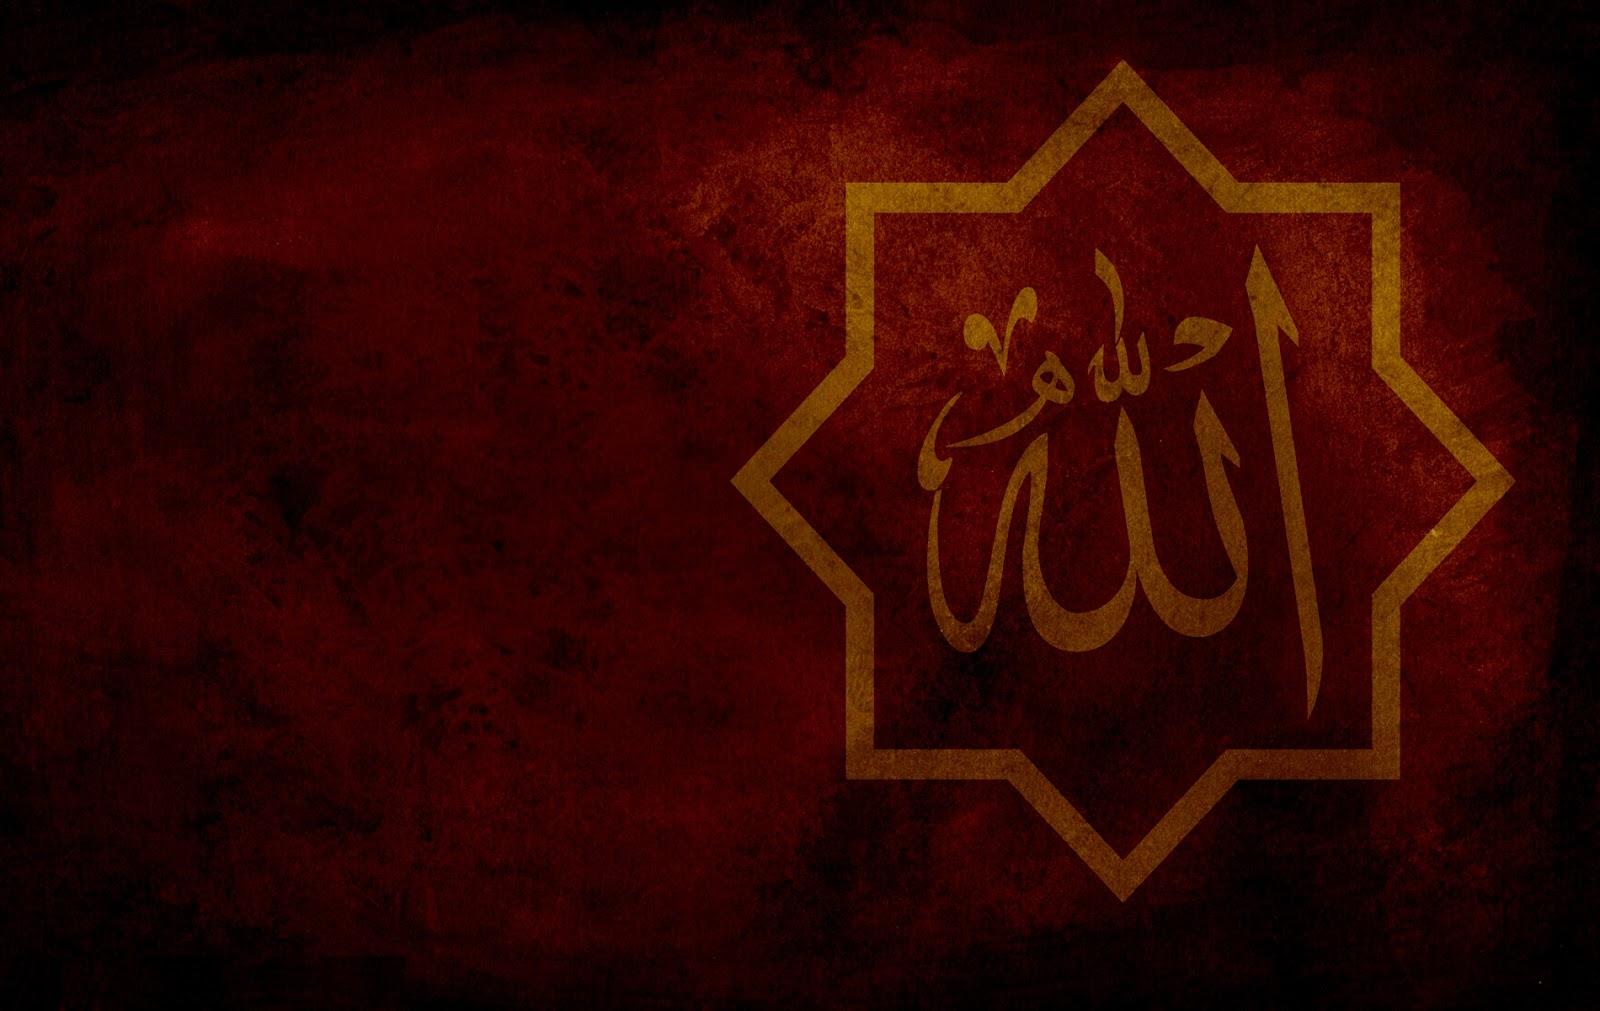 Lord Allah HD Wallpapers | Movies Songs Lyrics